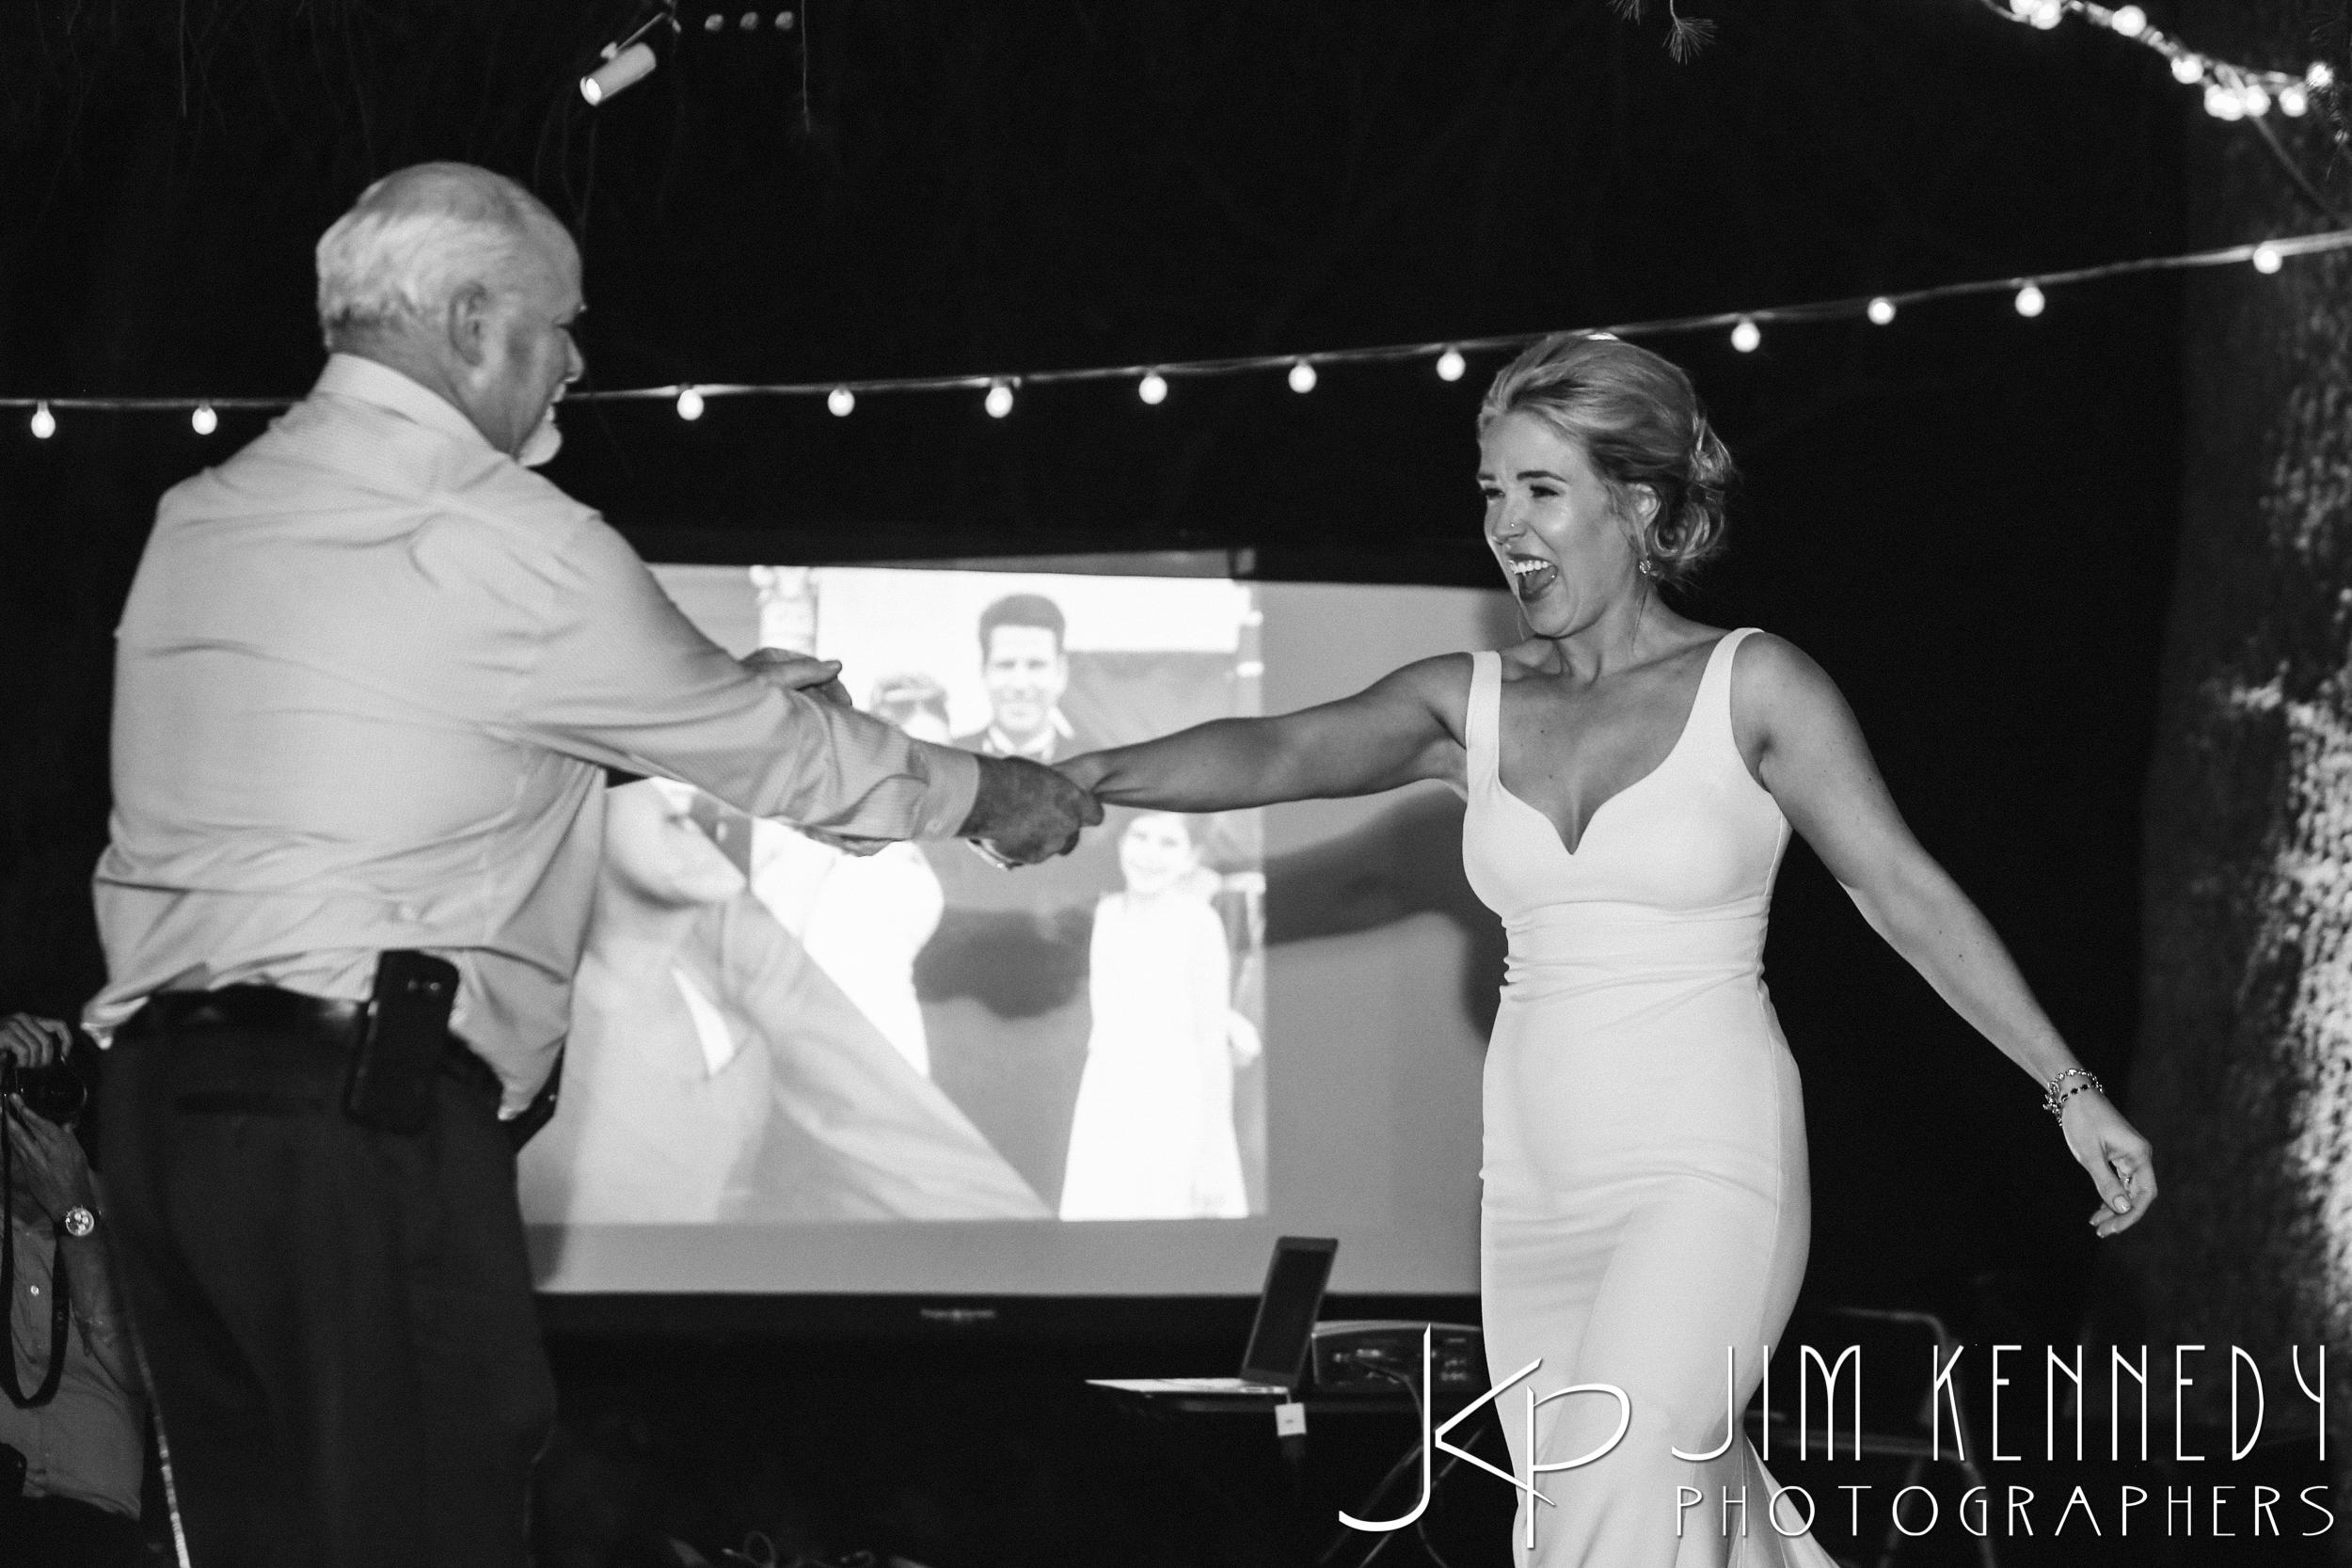 jim_kennedy_photographers_highland_springs_wedding_caitlyn_0199.jpg